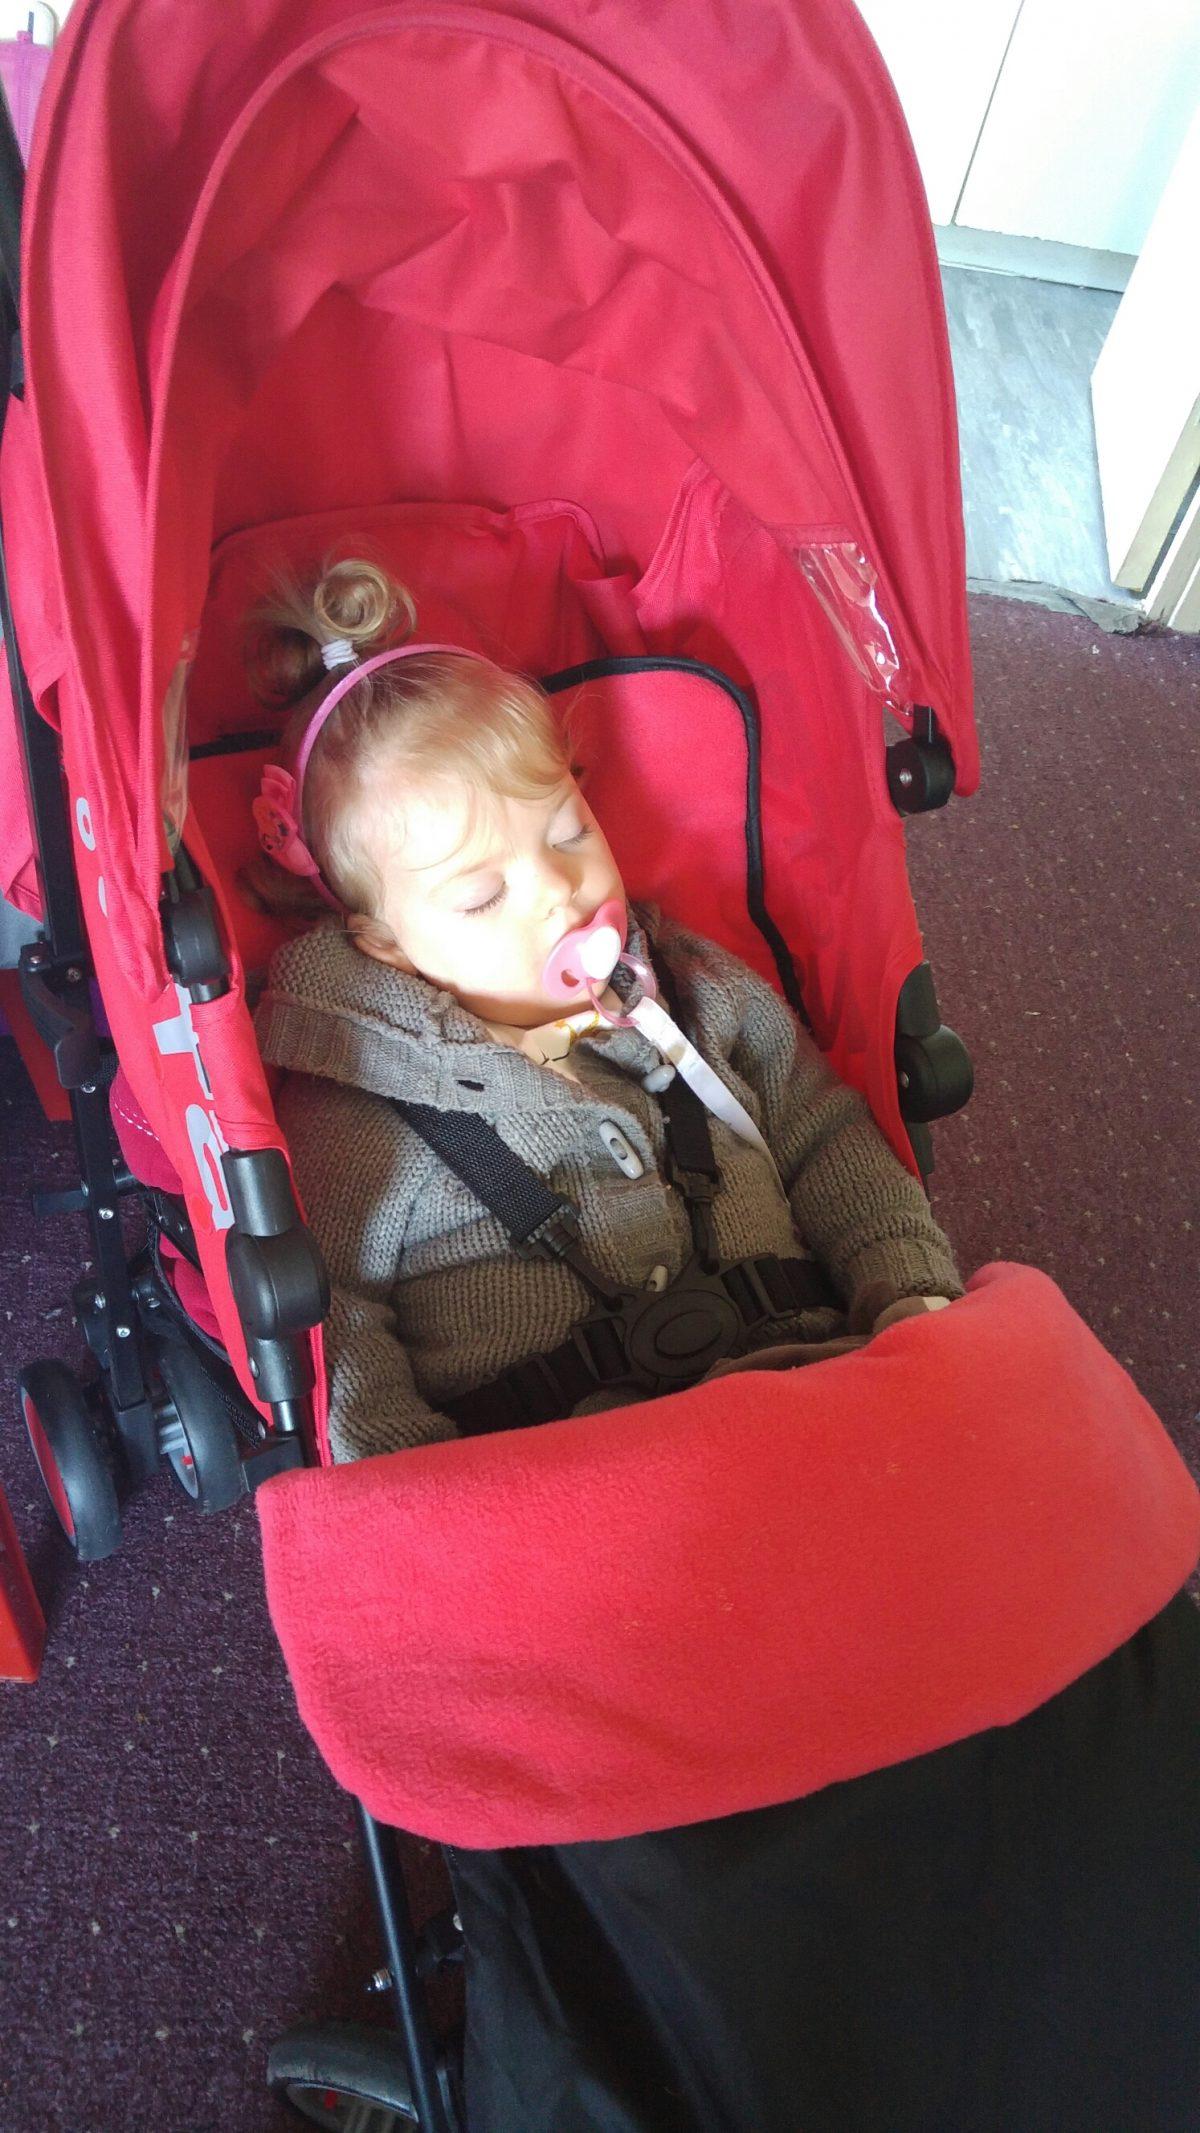 Sleeping in her stroller